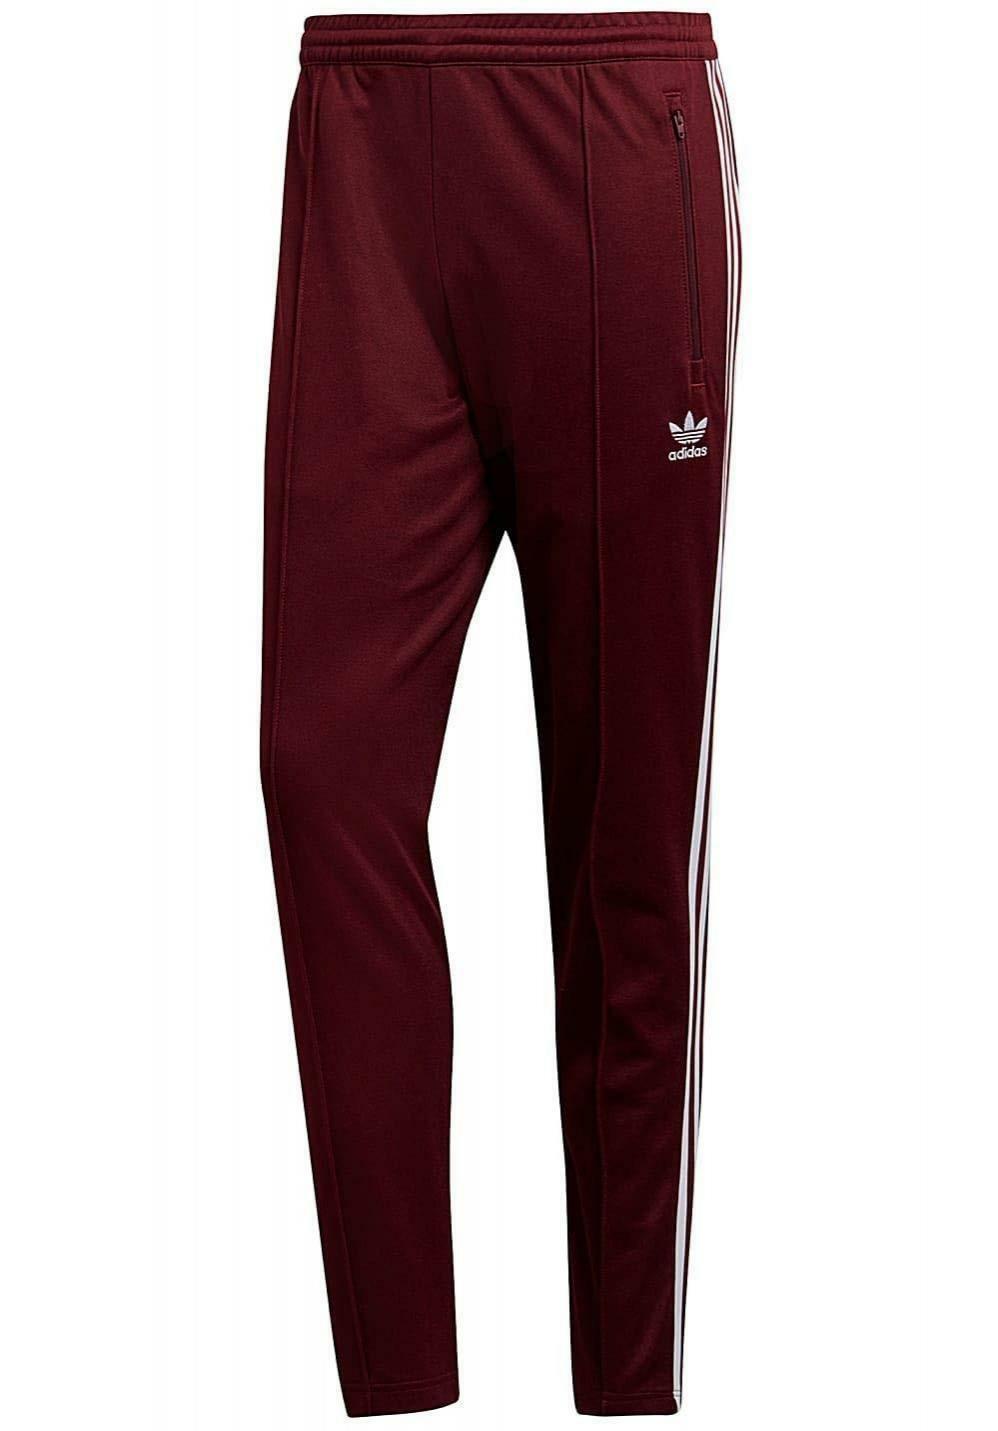 sportshock ADIDAS originals pantalone beckenbauer bordeaux